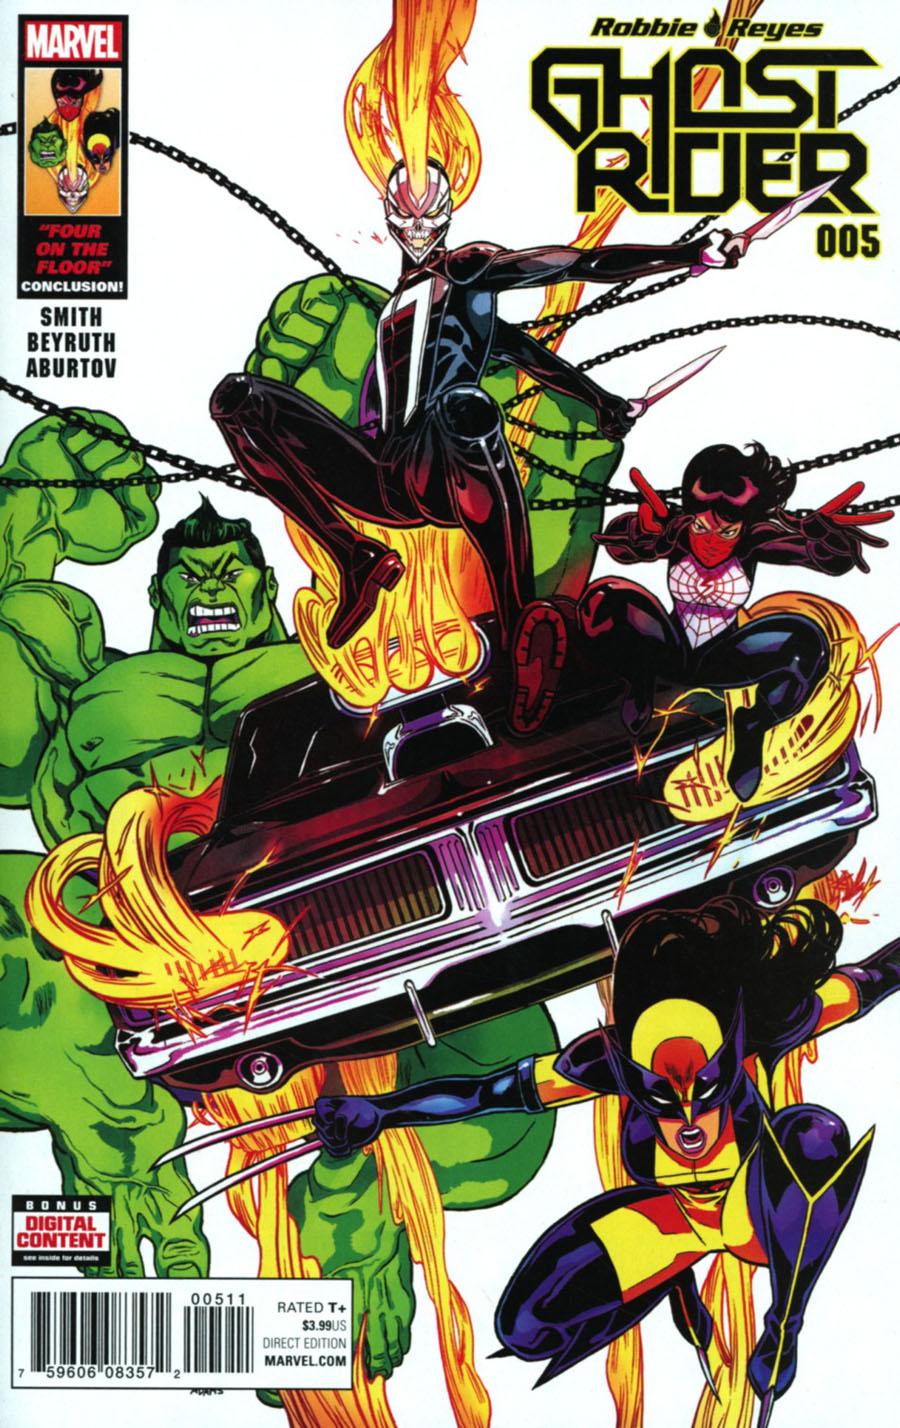 Ghost Rider Vol 7 #5 Cover A Regular Felipe Smith Cover